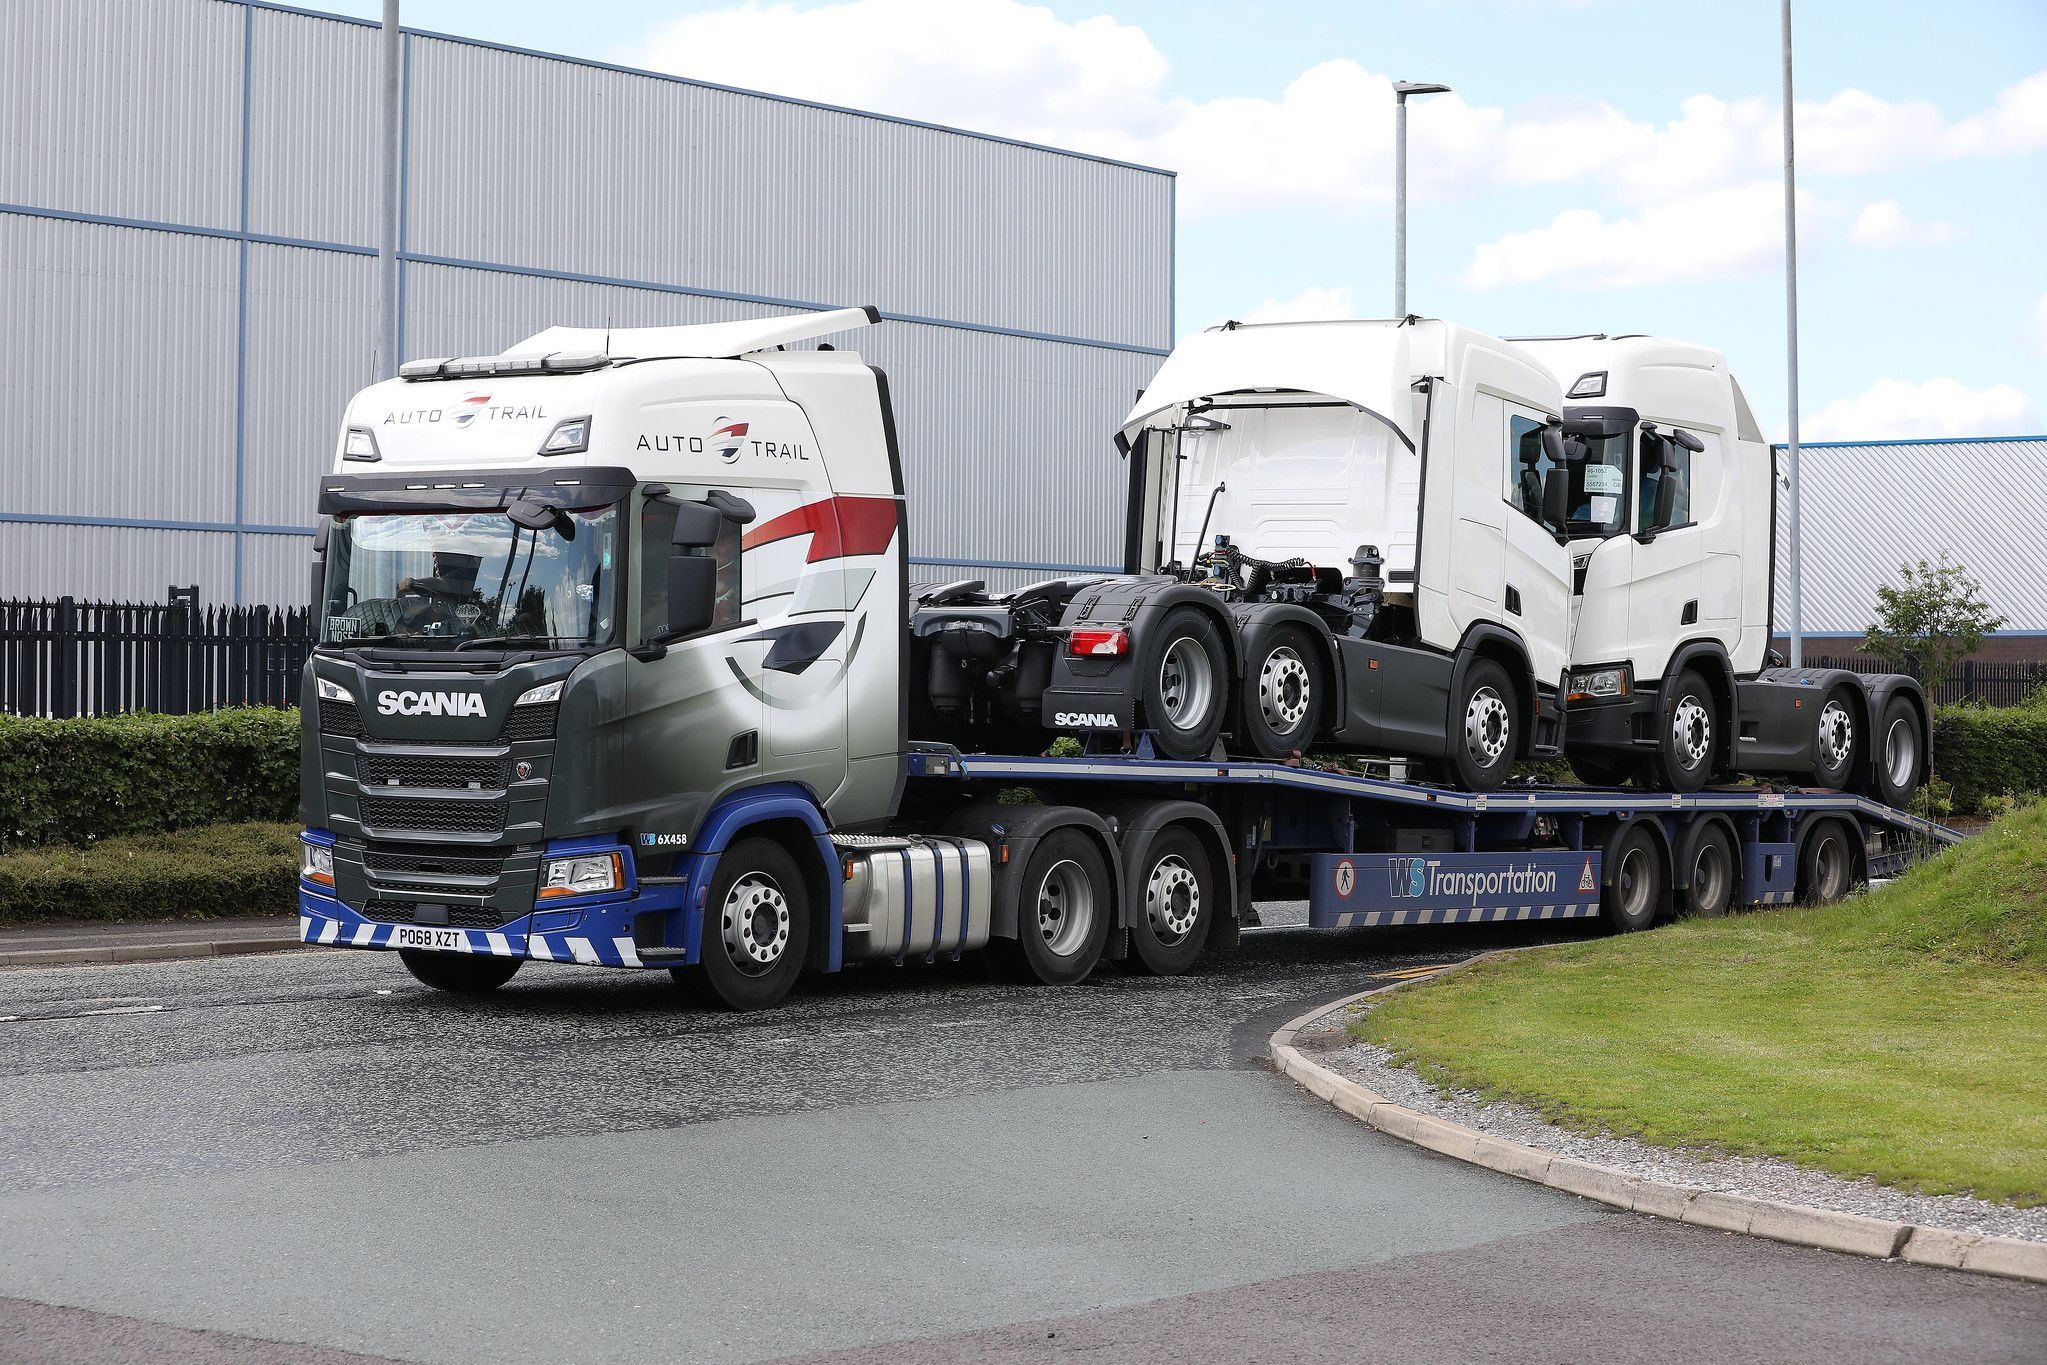 6x458 Appleton 20 6 19 Heavy Truck Trucks Trailers For Sale